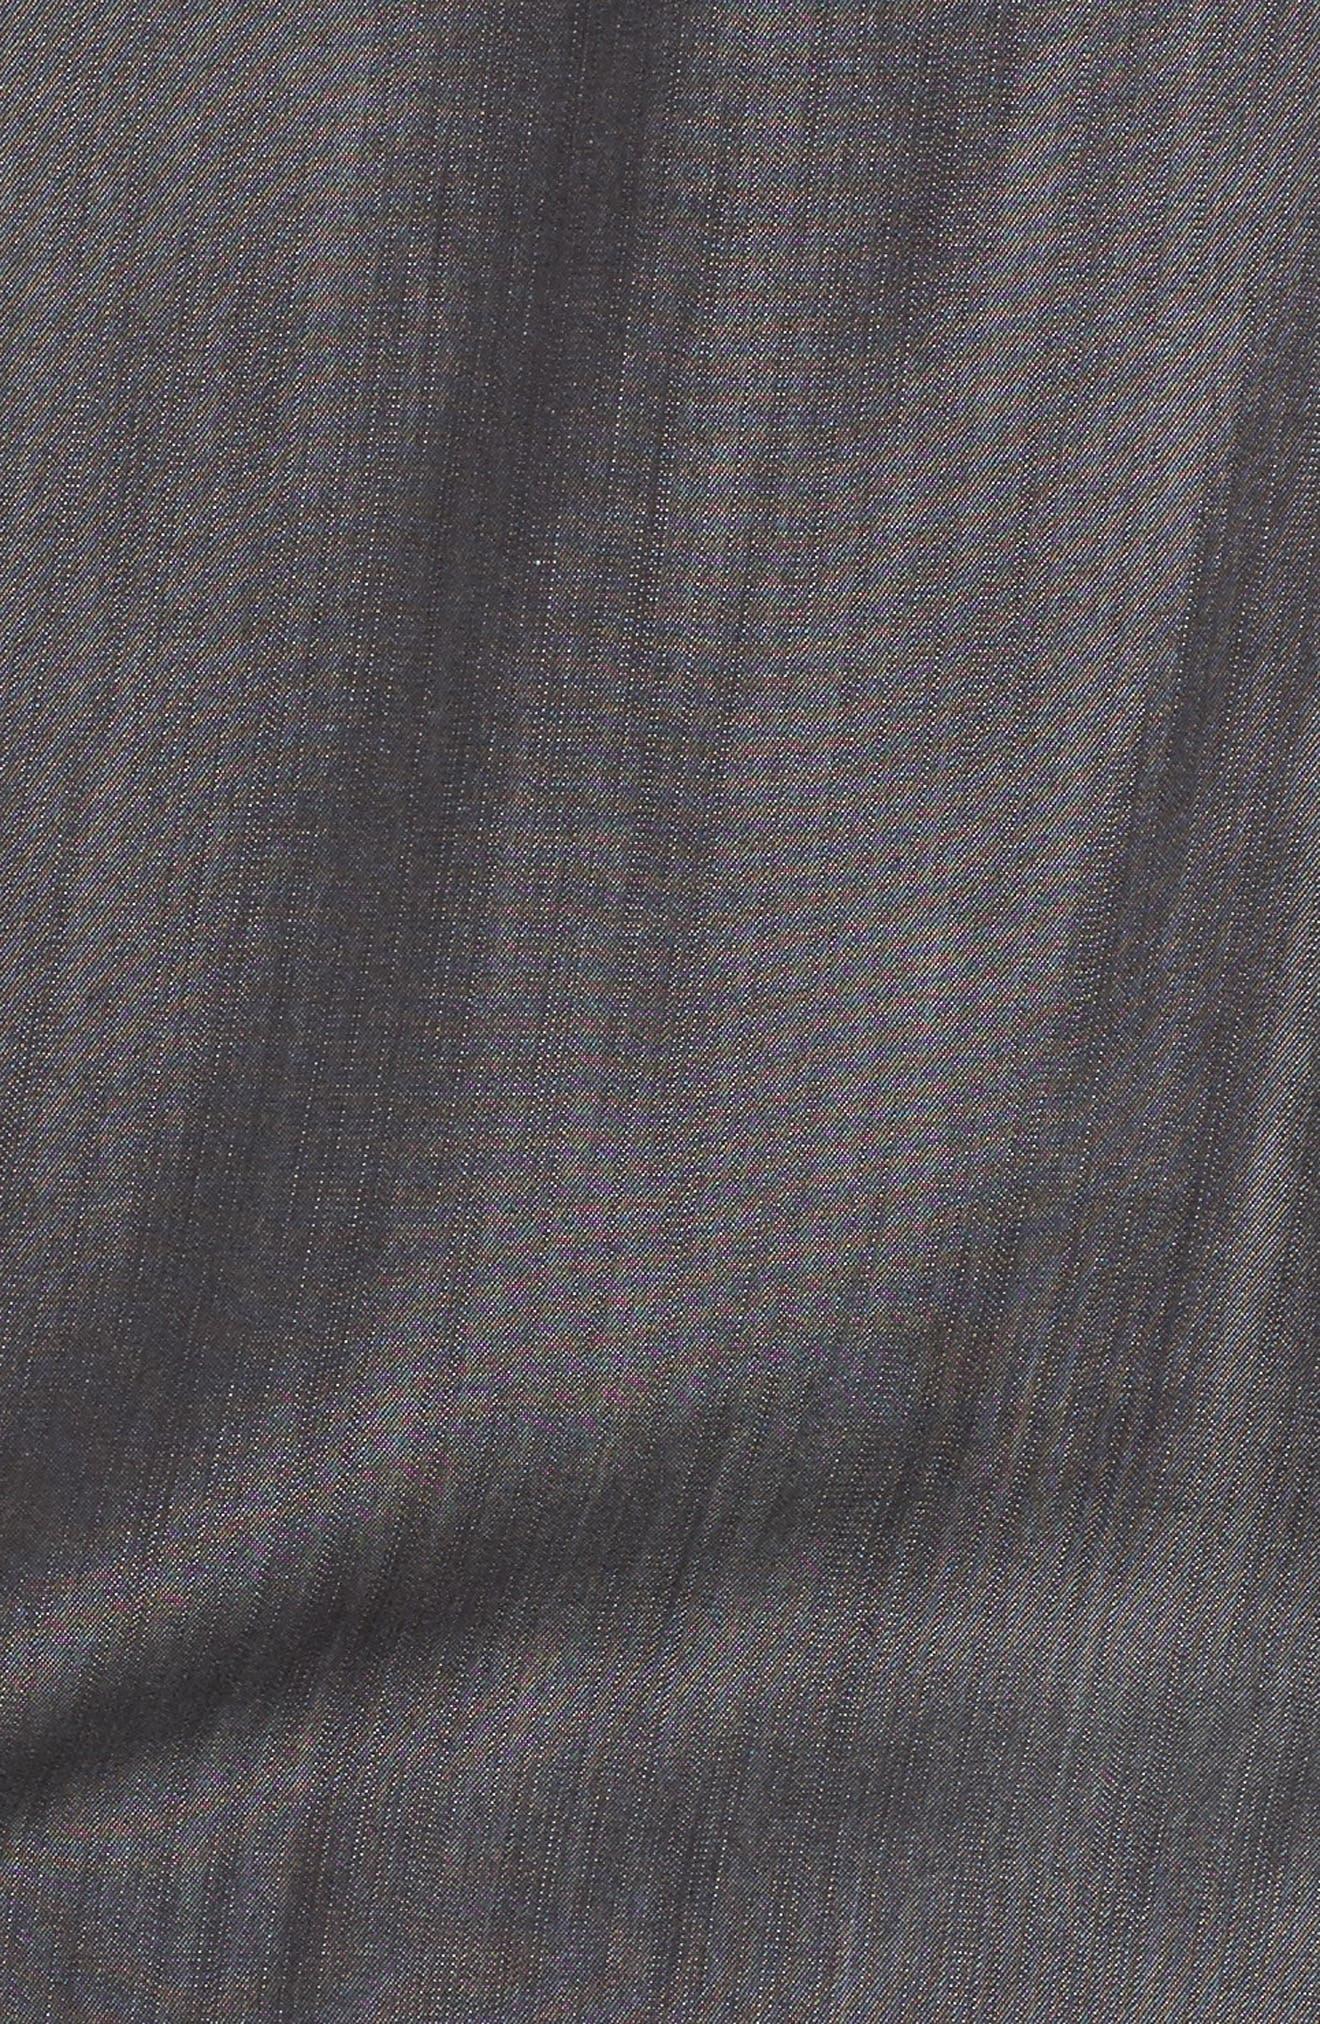 Chambray Tunic,                             Alternate thumbnail 5, color,                             Charcoal